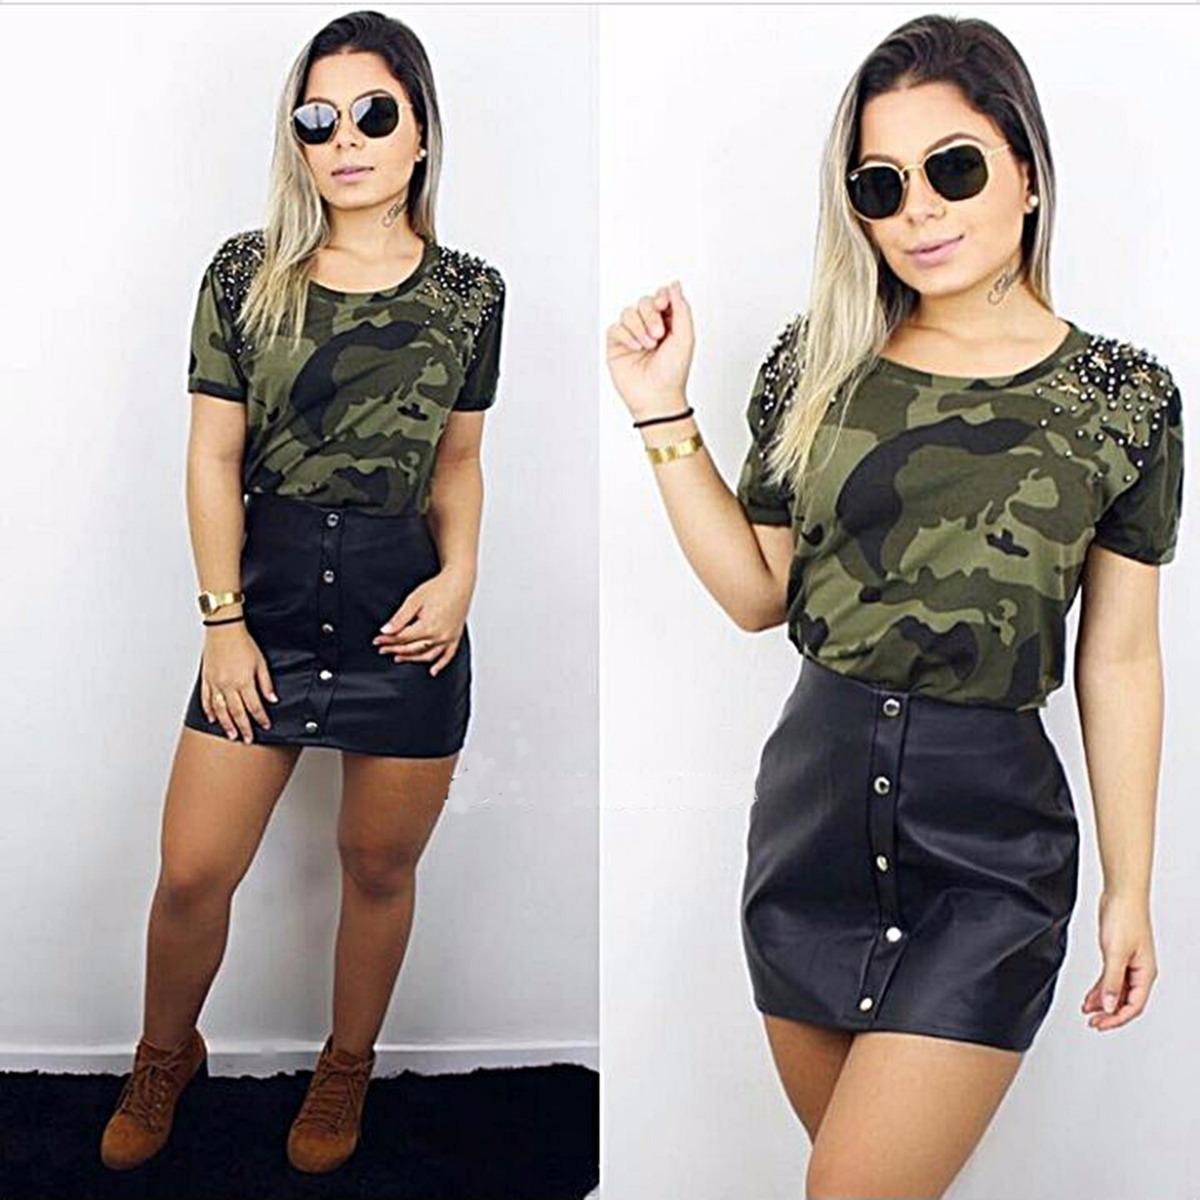 a87e334eb7 camiseta tumblr girl roupas femininas 2805. Carregando zoom.